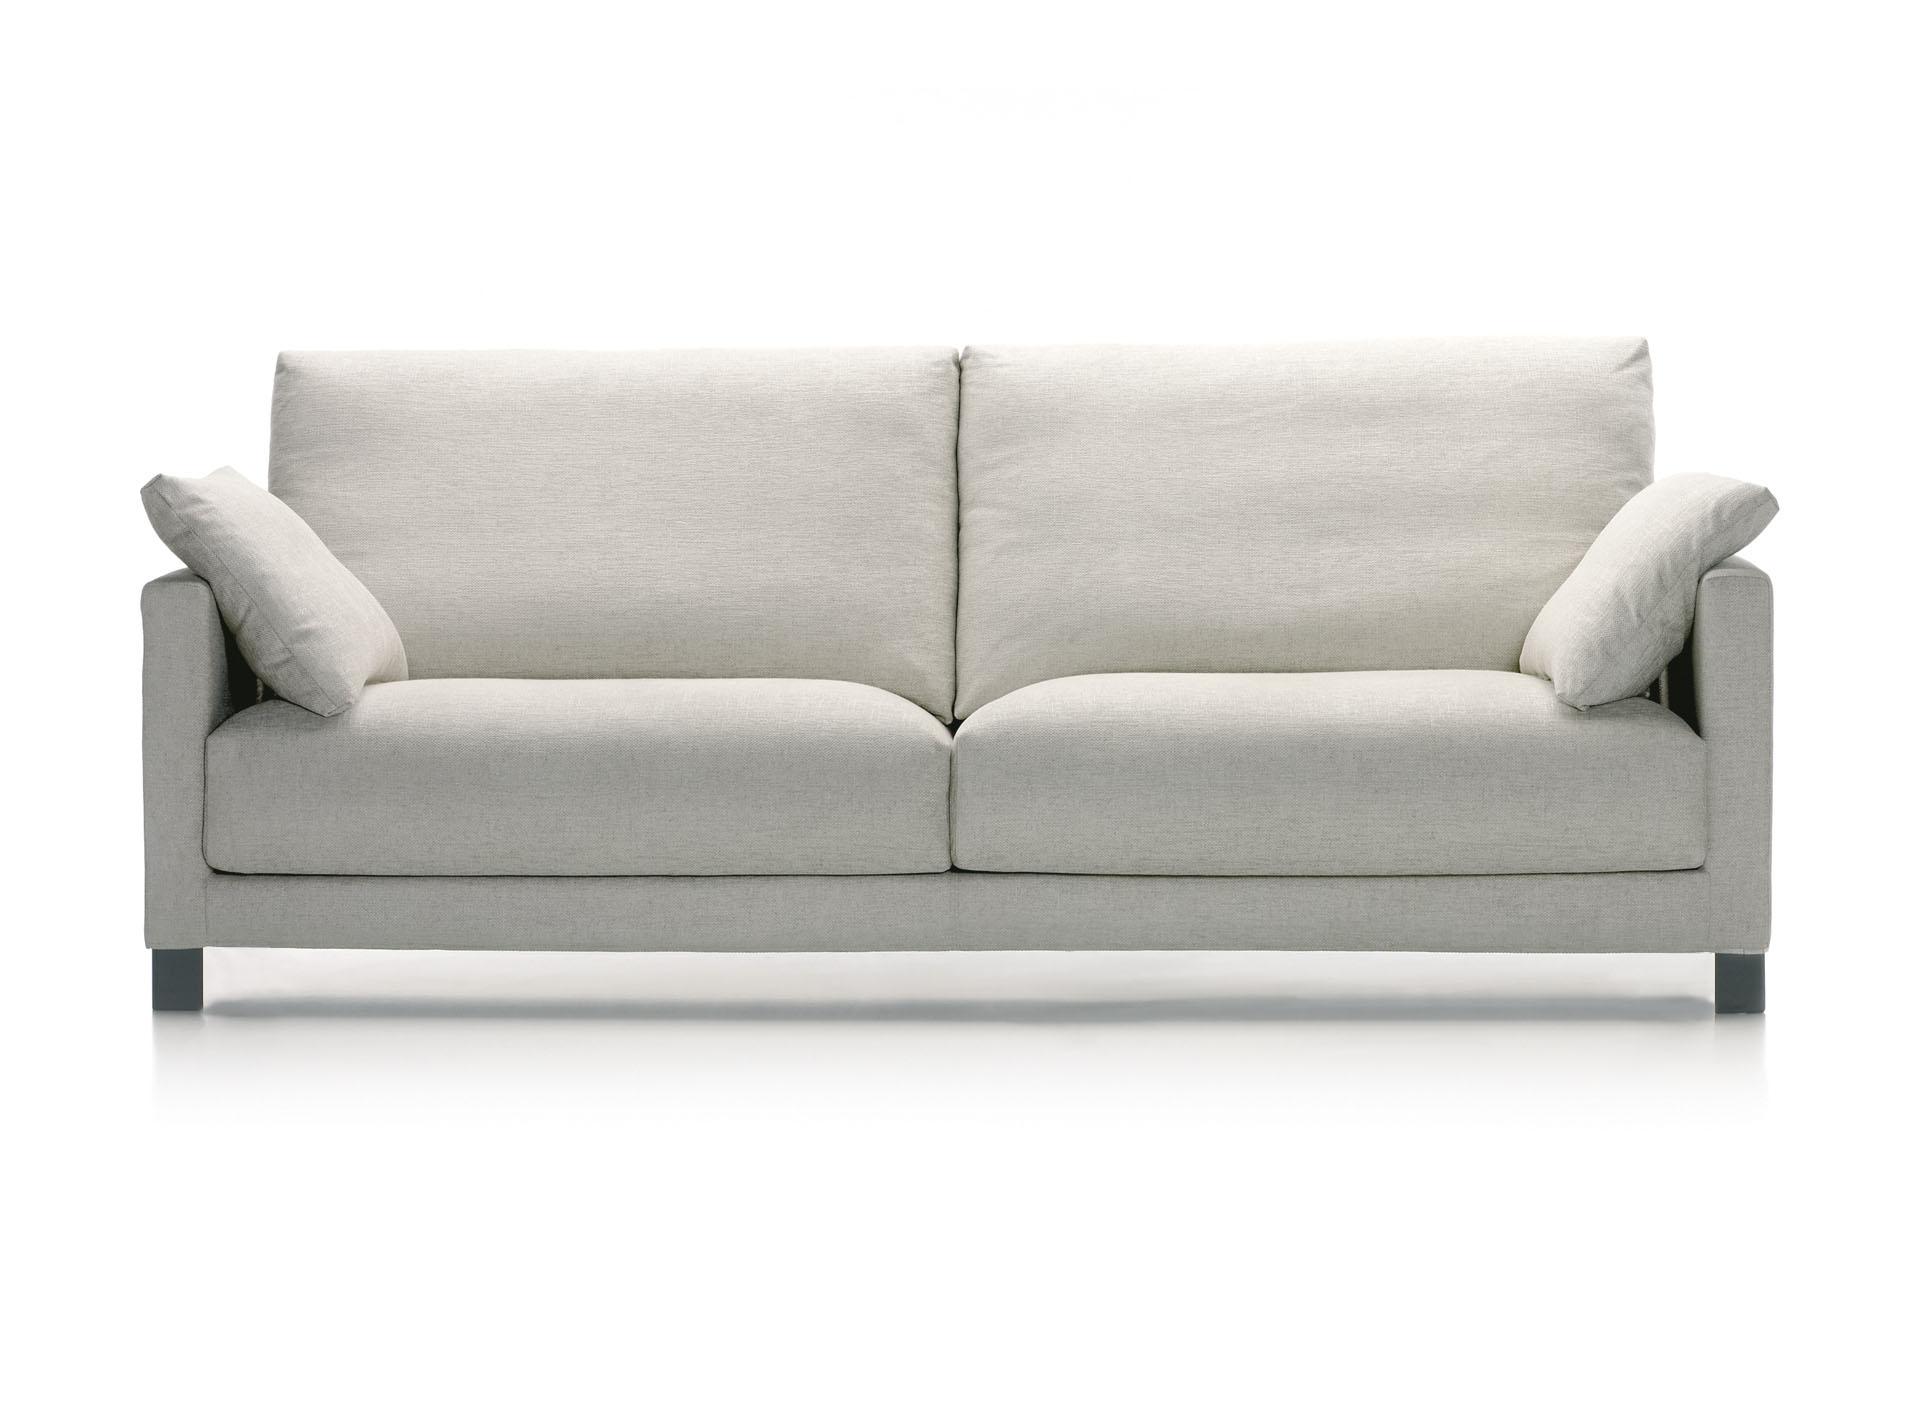 Sofa blanco fabulous sof de piel blanco with sofa blanco - Sofa blanco polipiel ...